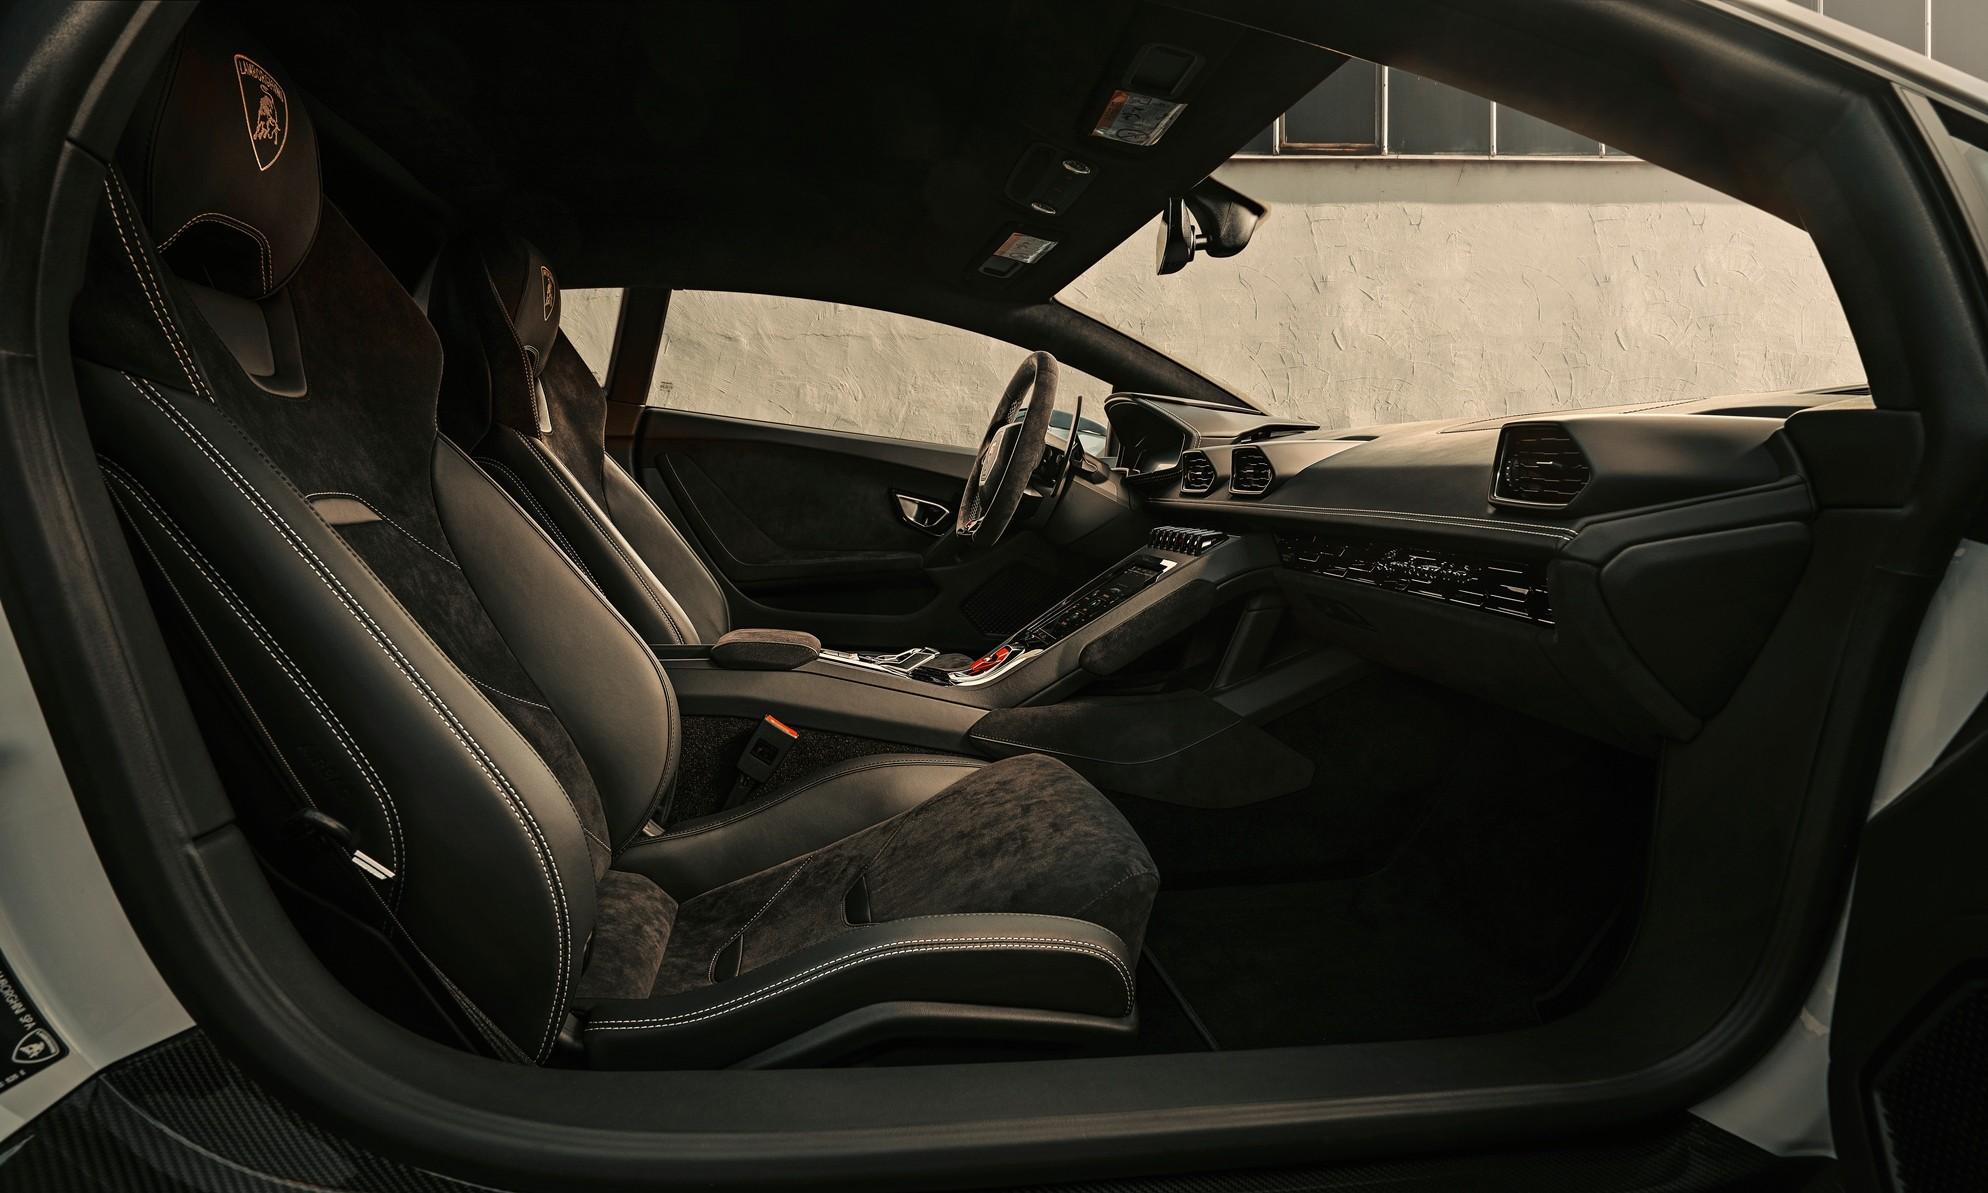 Novitec Lamborghini Huracan Evo interior